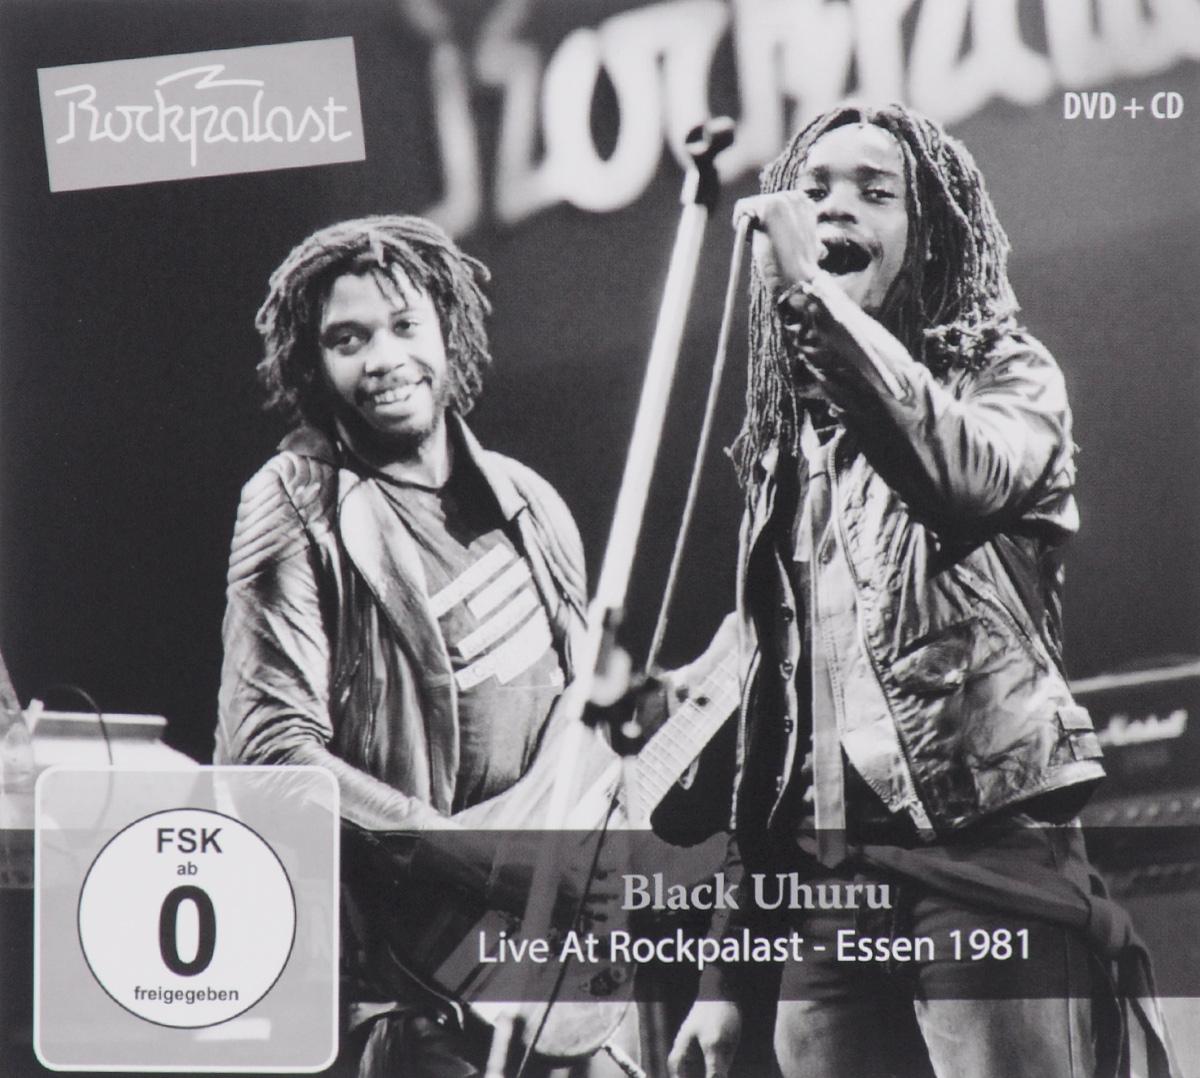 Black Uhuru Black Uhuru. Live At Rockpalast. Essen 1981 (CD + DVD) mother s finest live at rockpalast dvd 2 cd